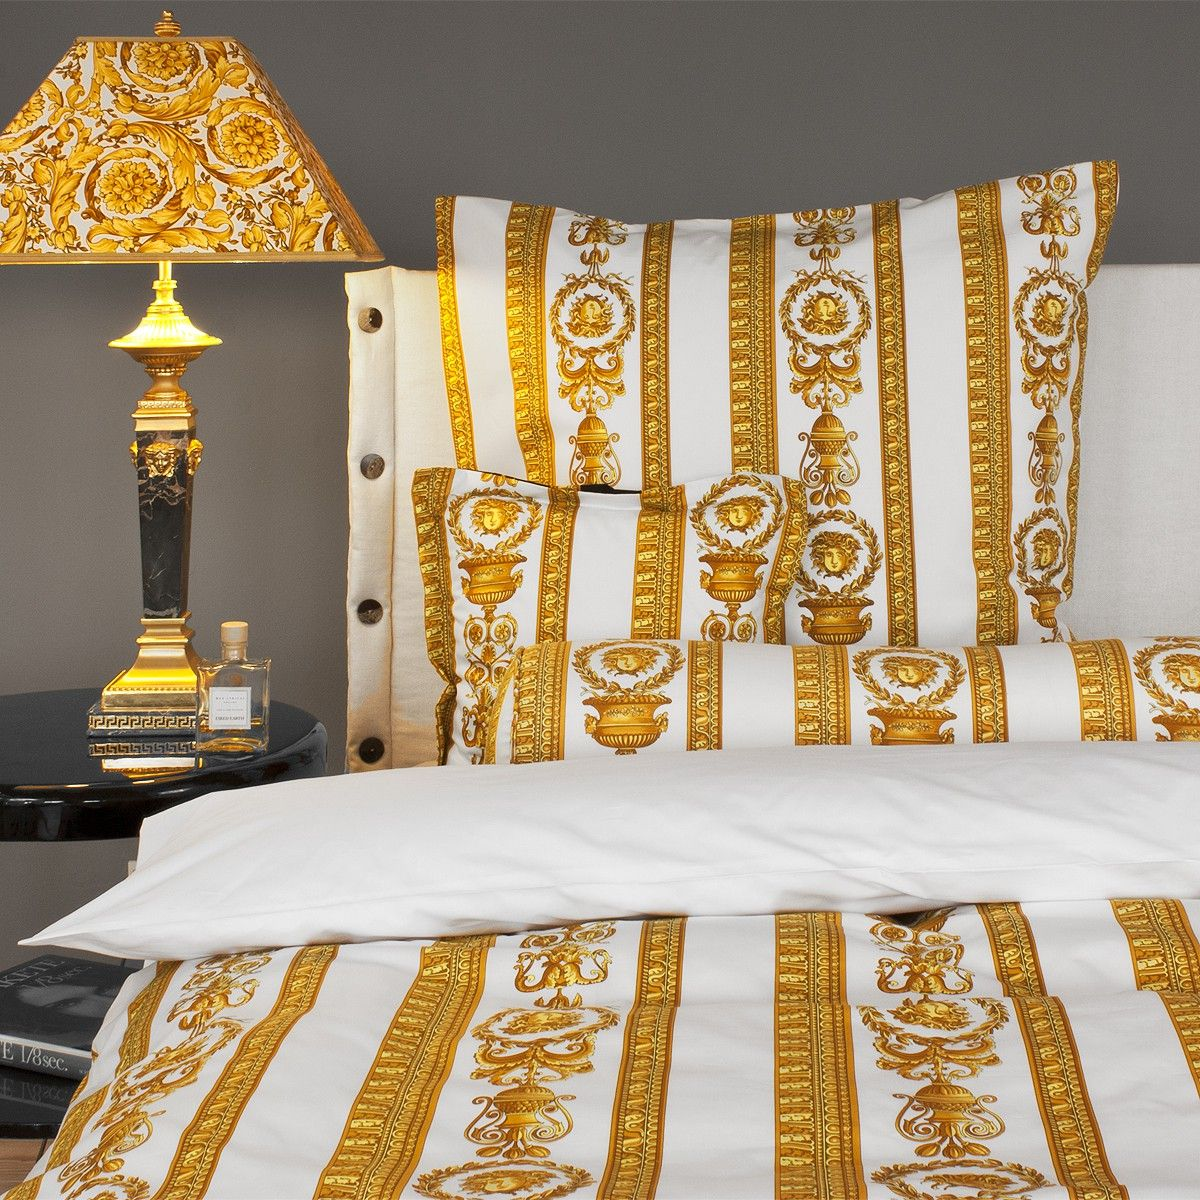 versace bettw sche medusa versace home pinterest. Black Bedroom Furniture Sets. Home Design Ideas